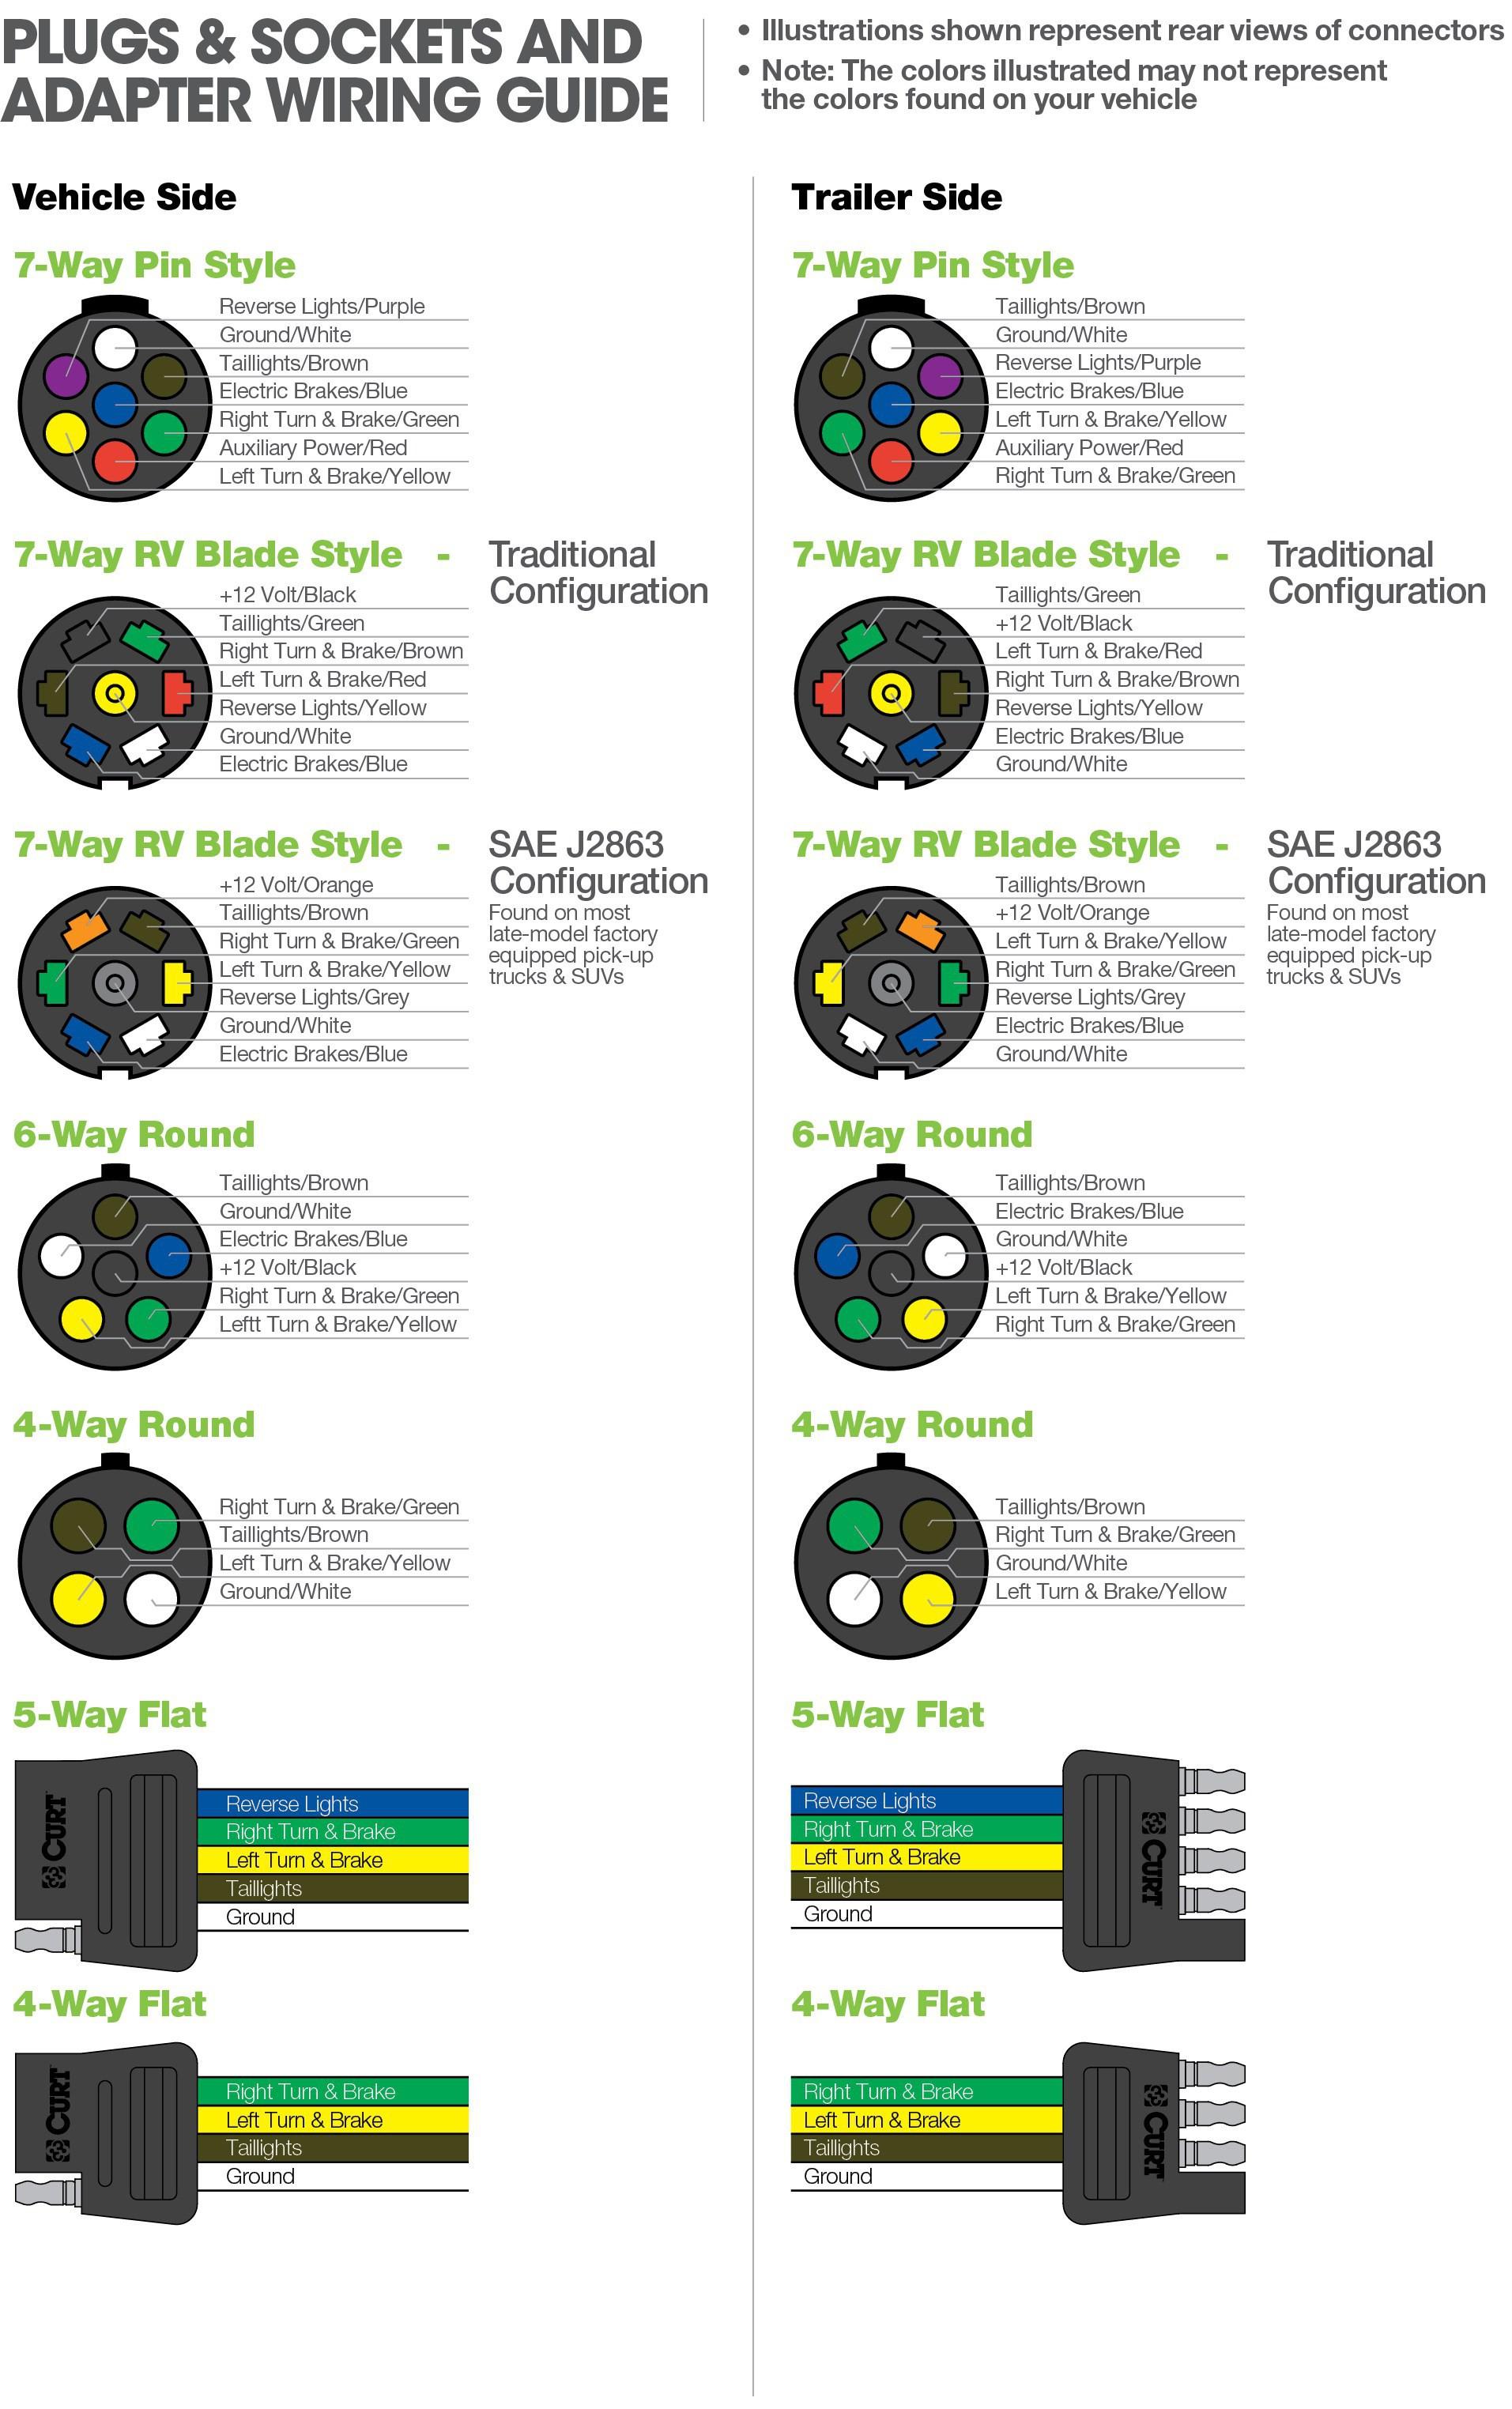 Ford 7 Pin Trailer Plug Wiring Diagram | Releaseganji - 7 Pin Trailer Wiring Harness Diagram